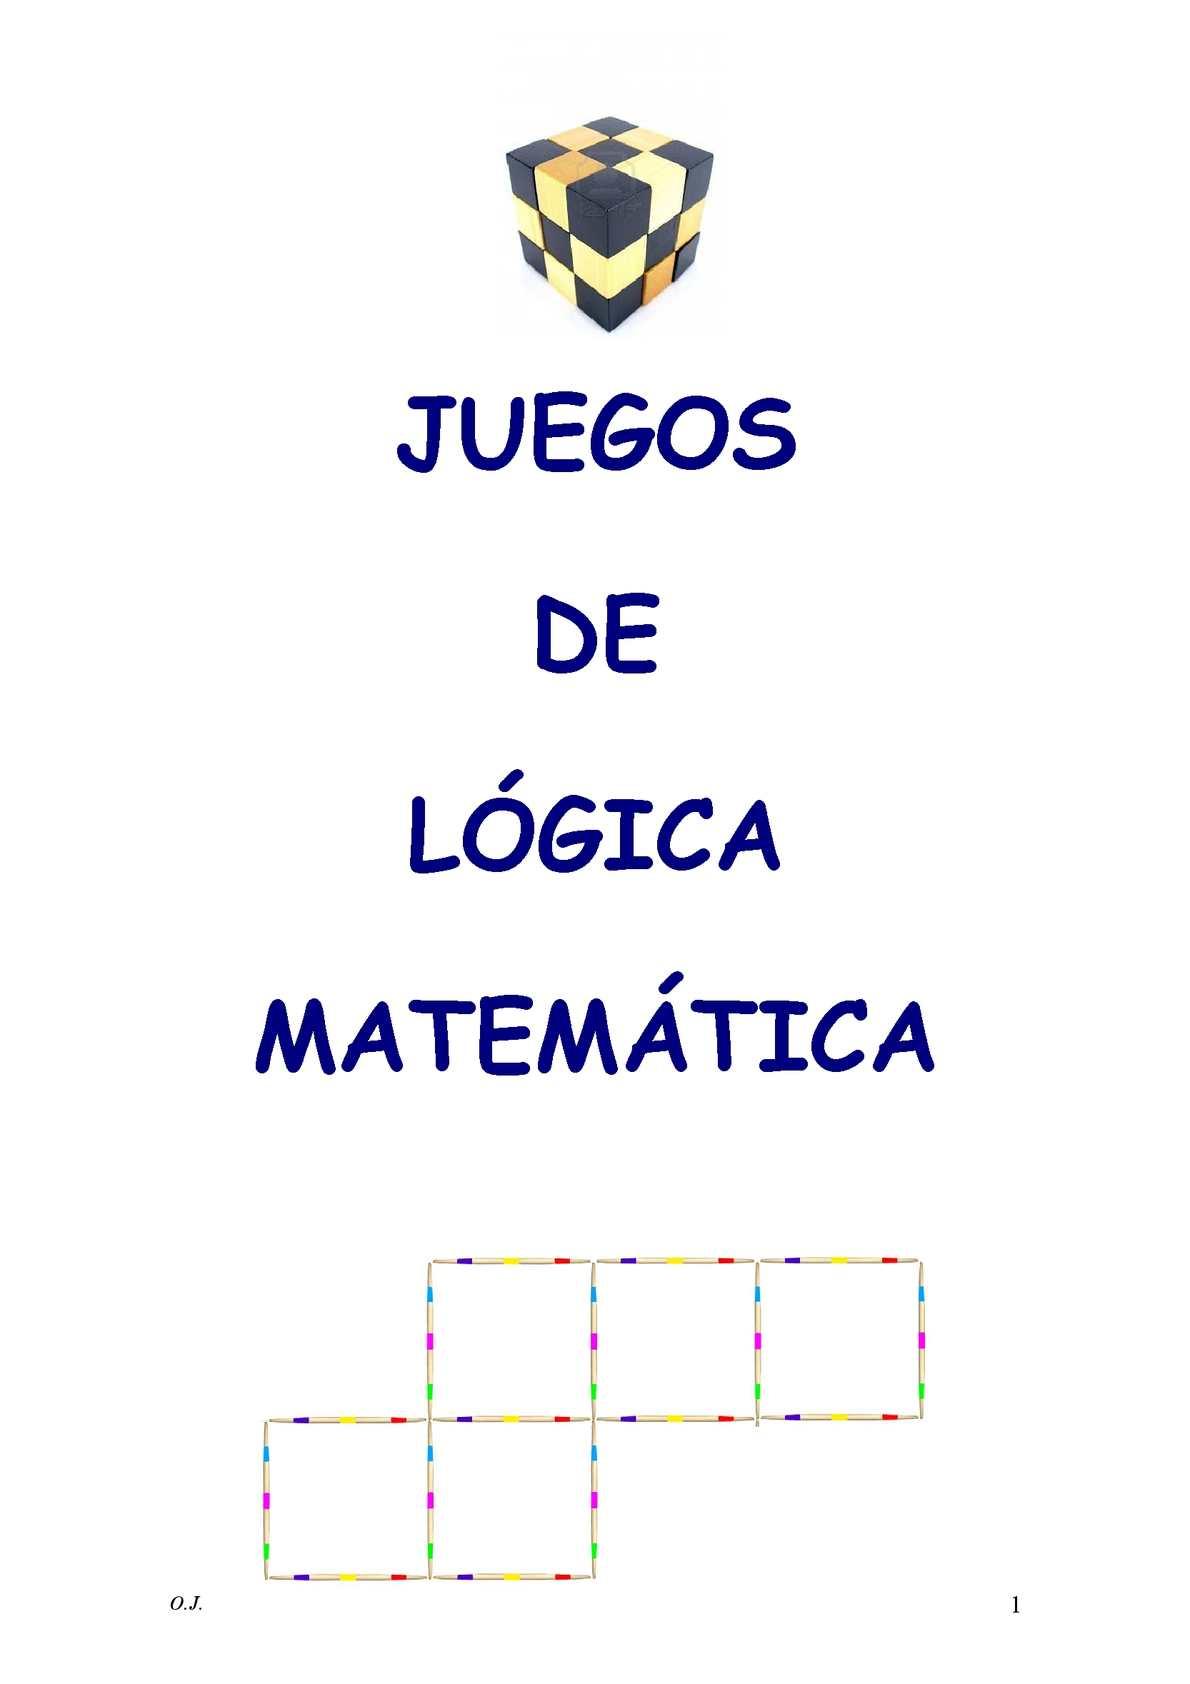 JUEGOS DE LÓGICA MATEMÁTICA